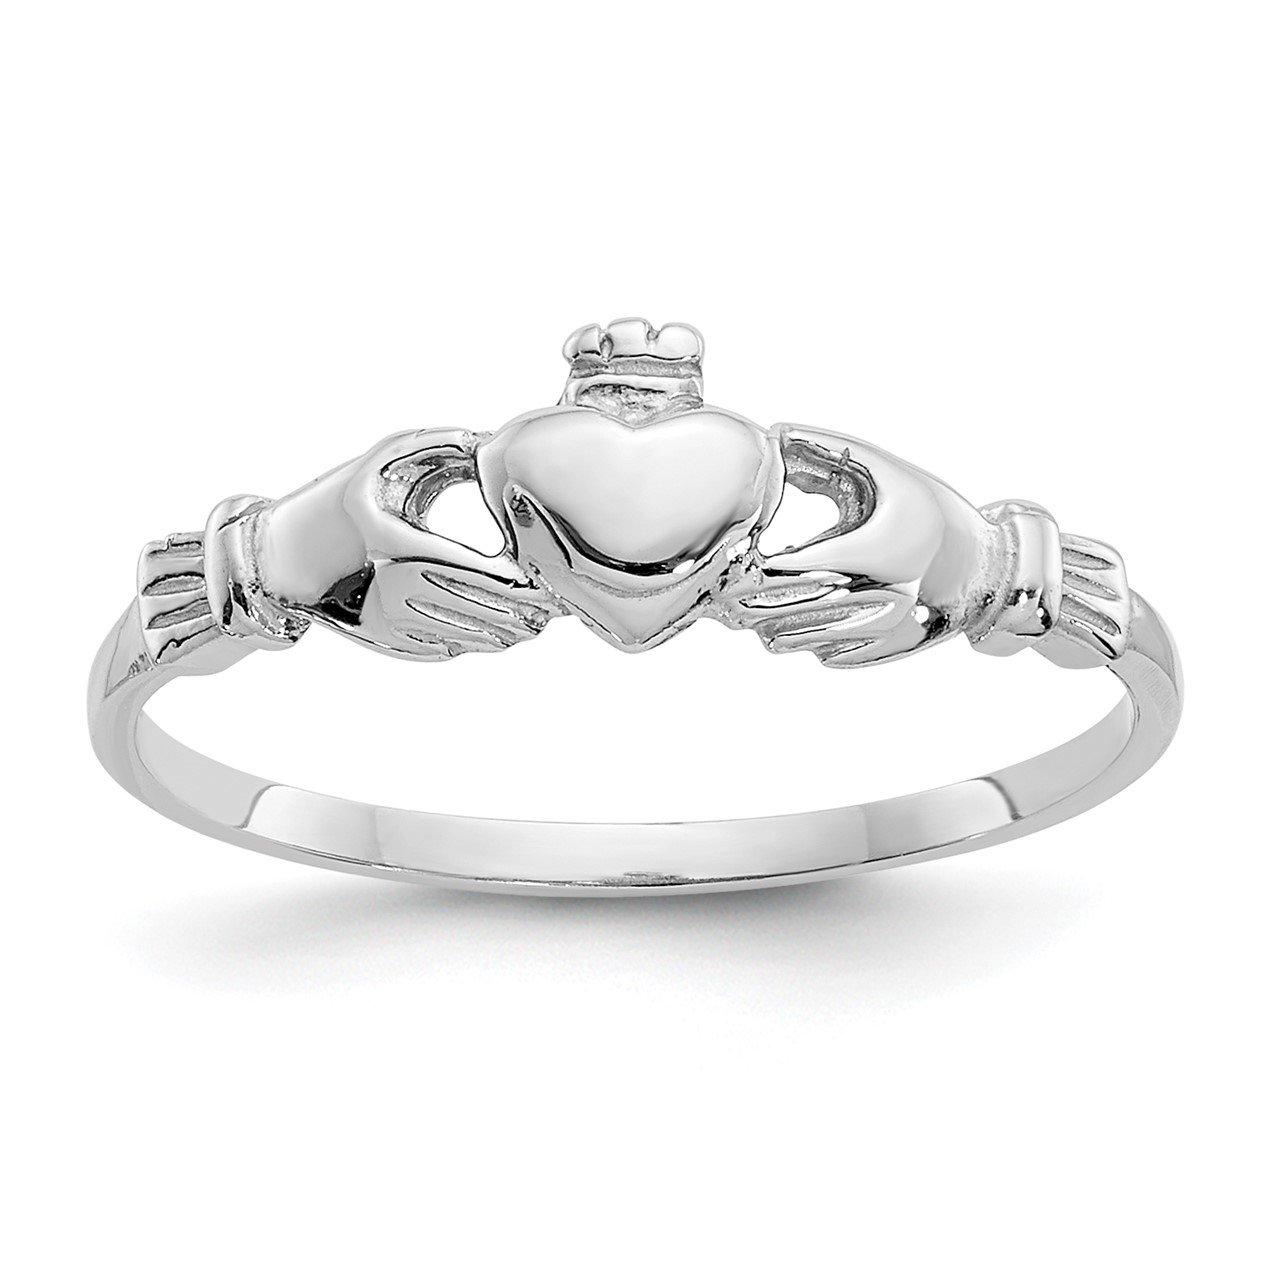 14k White Gold Child's Claddagh Ring